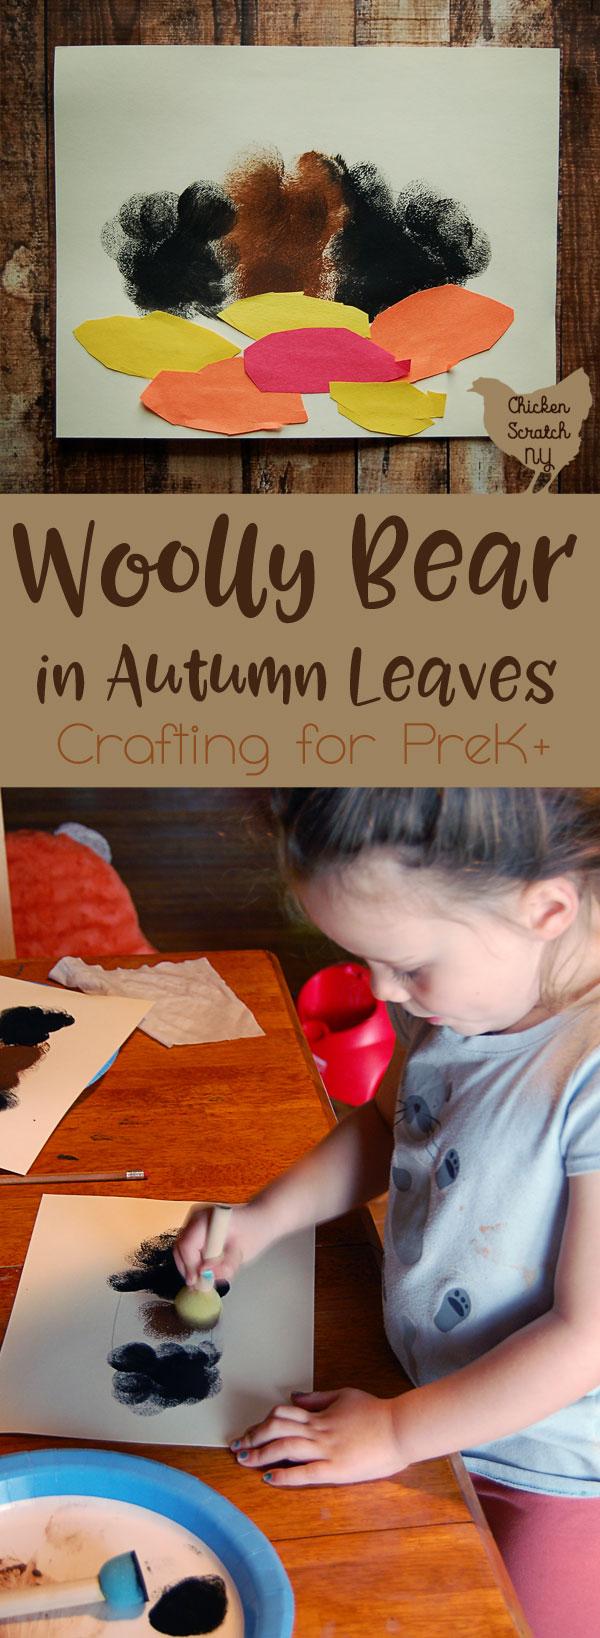 #fall #preschool #craft #fallcraft #prekcraft